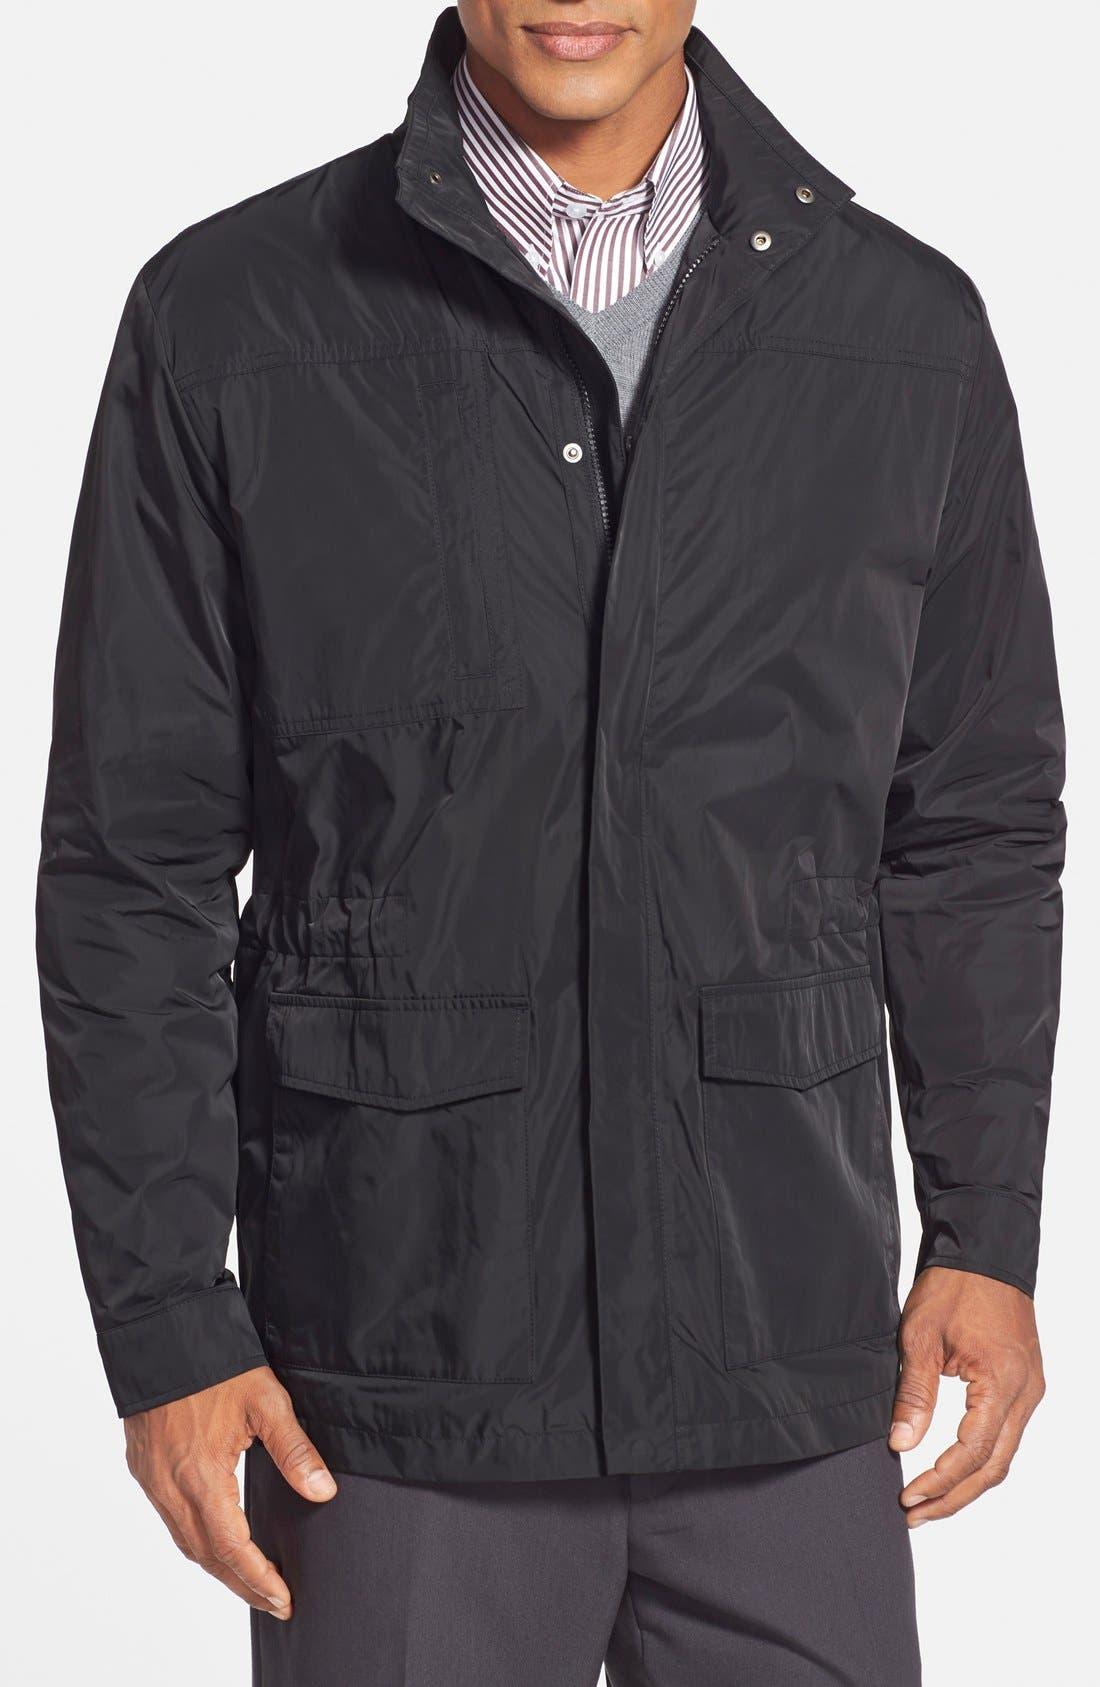 Birch Bay Water Resistant Jacket,                             Main thumbnail 1, color,                             BLACK